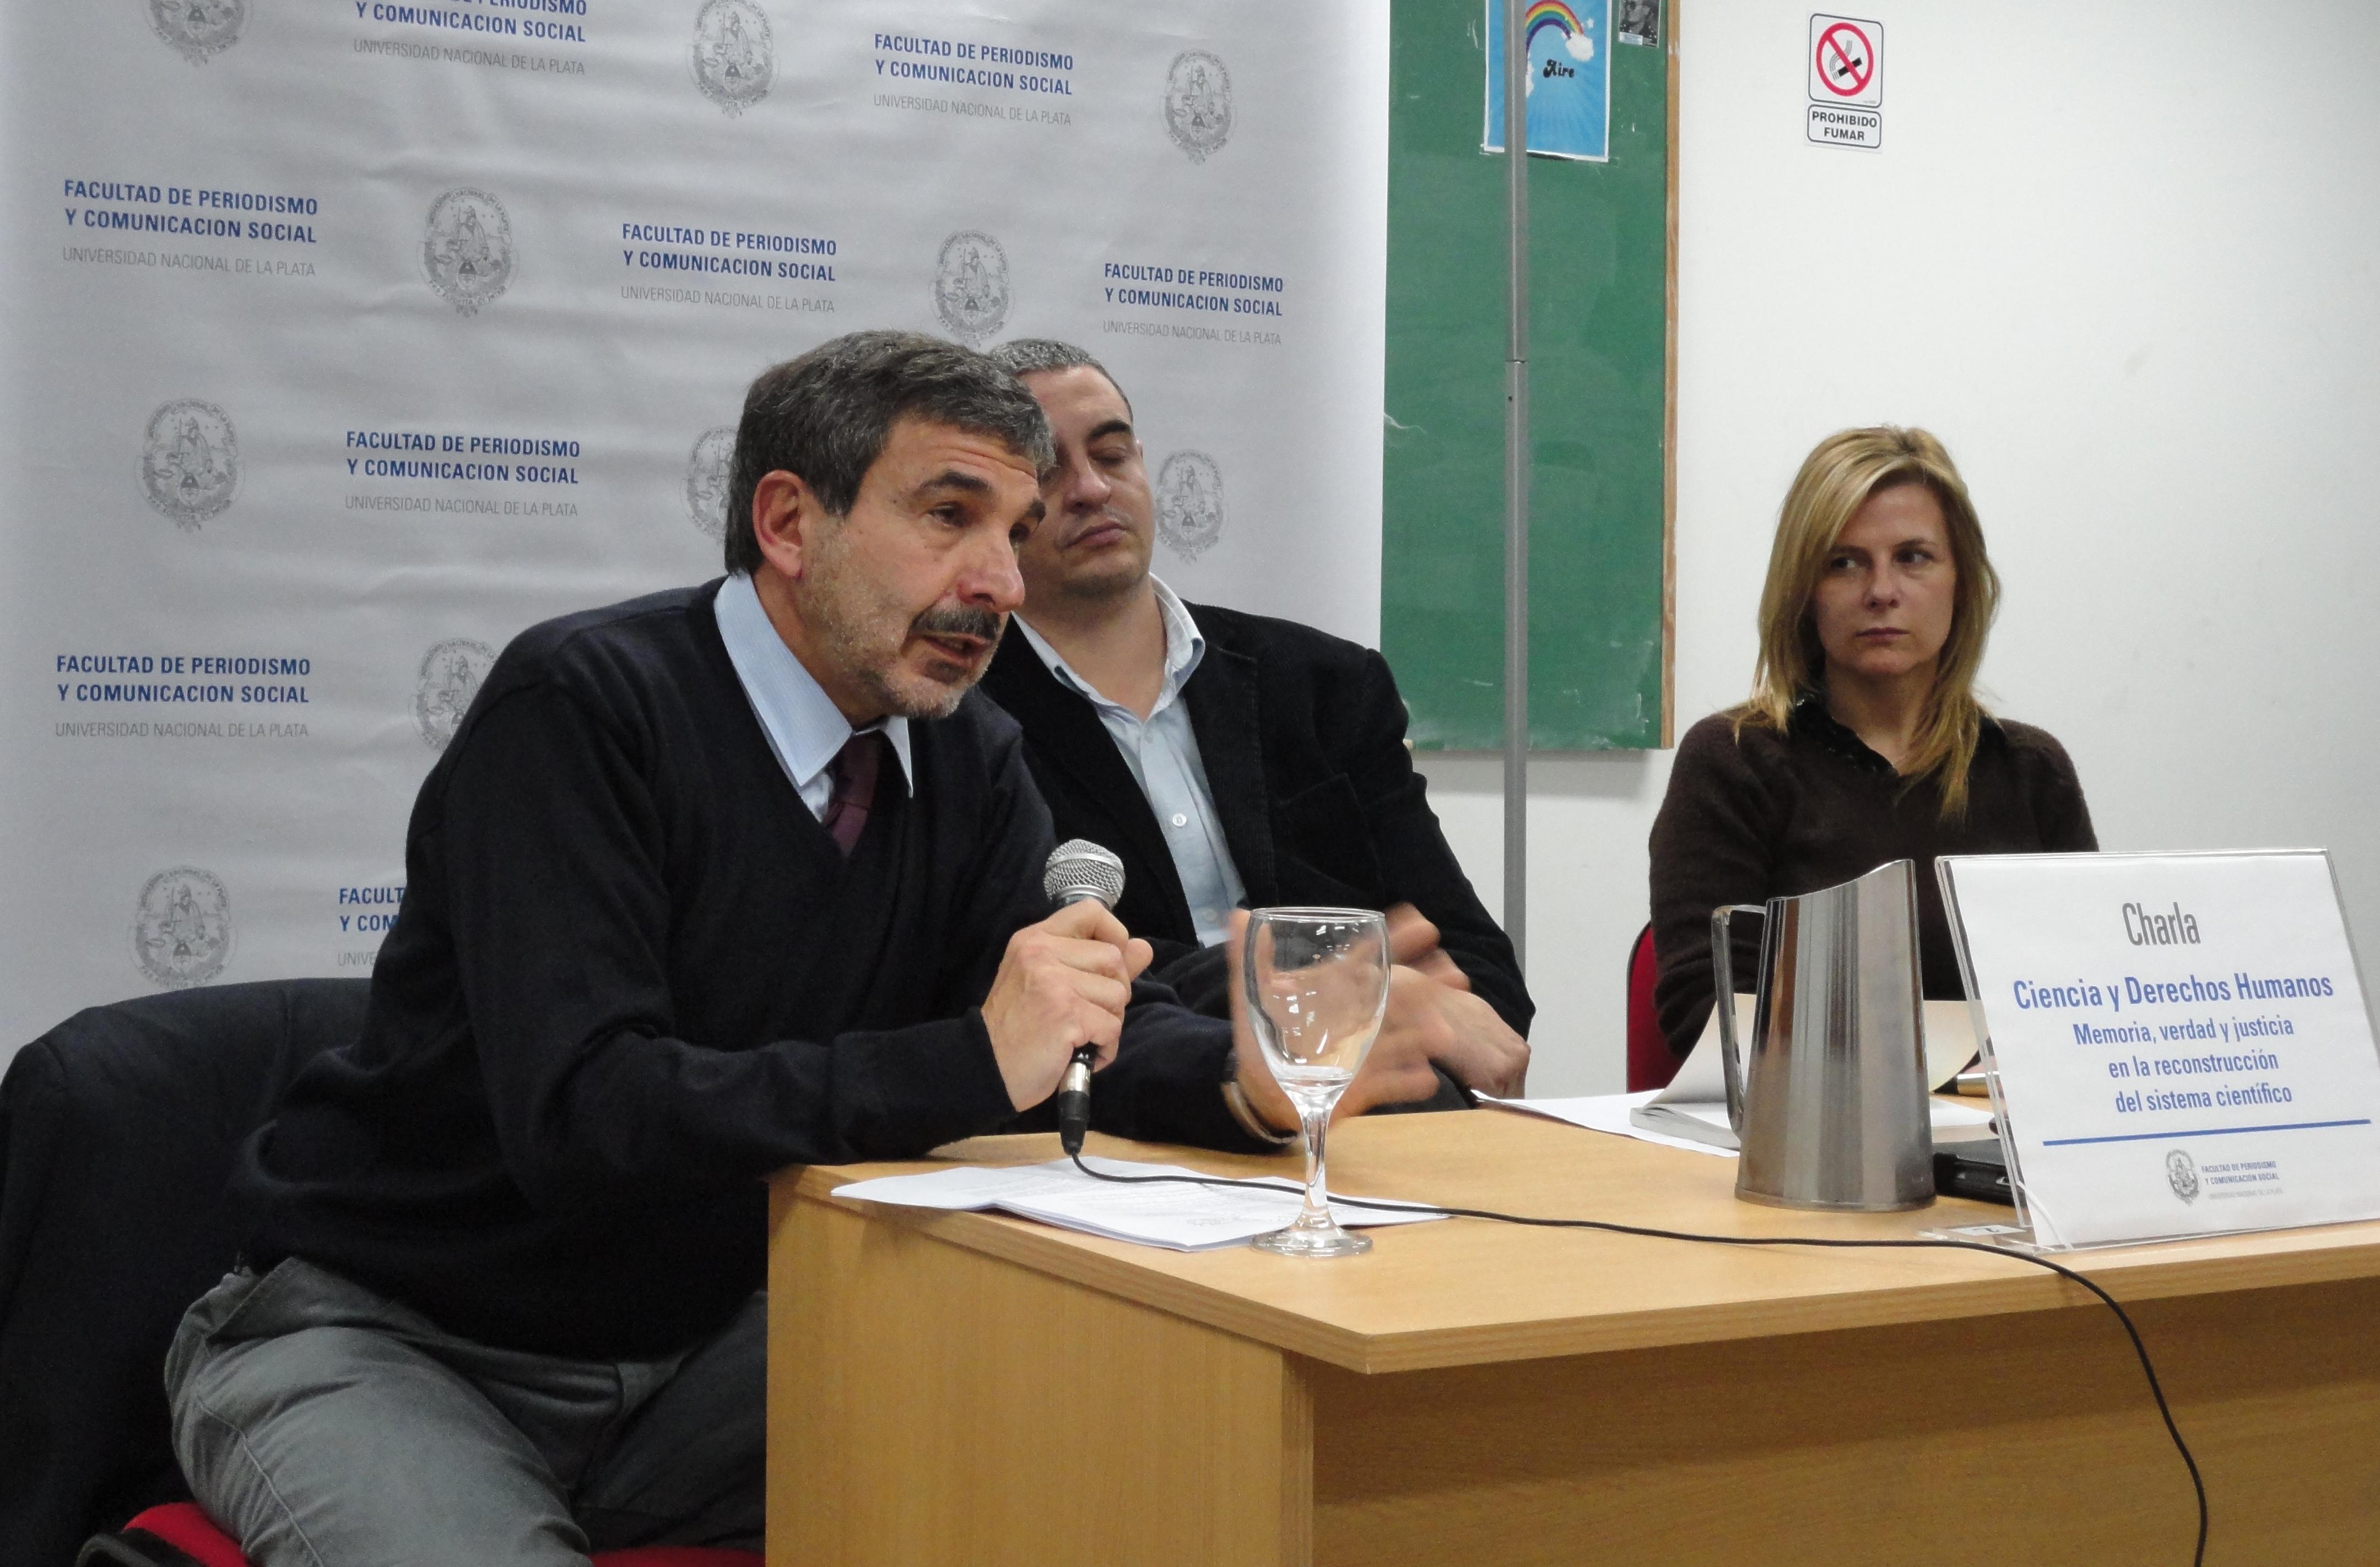 Roberto Salvarezza disertando en Periodismo